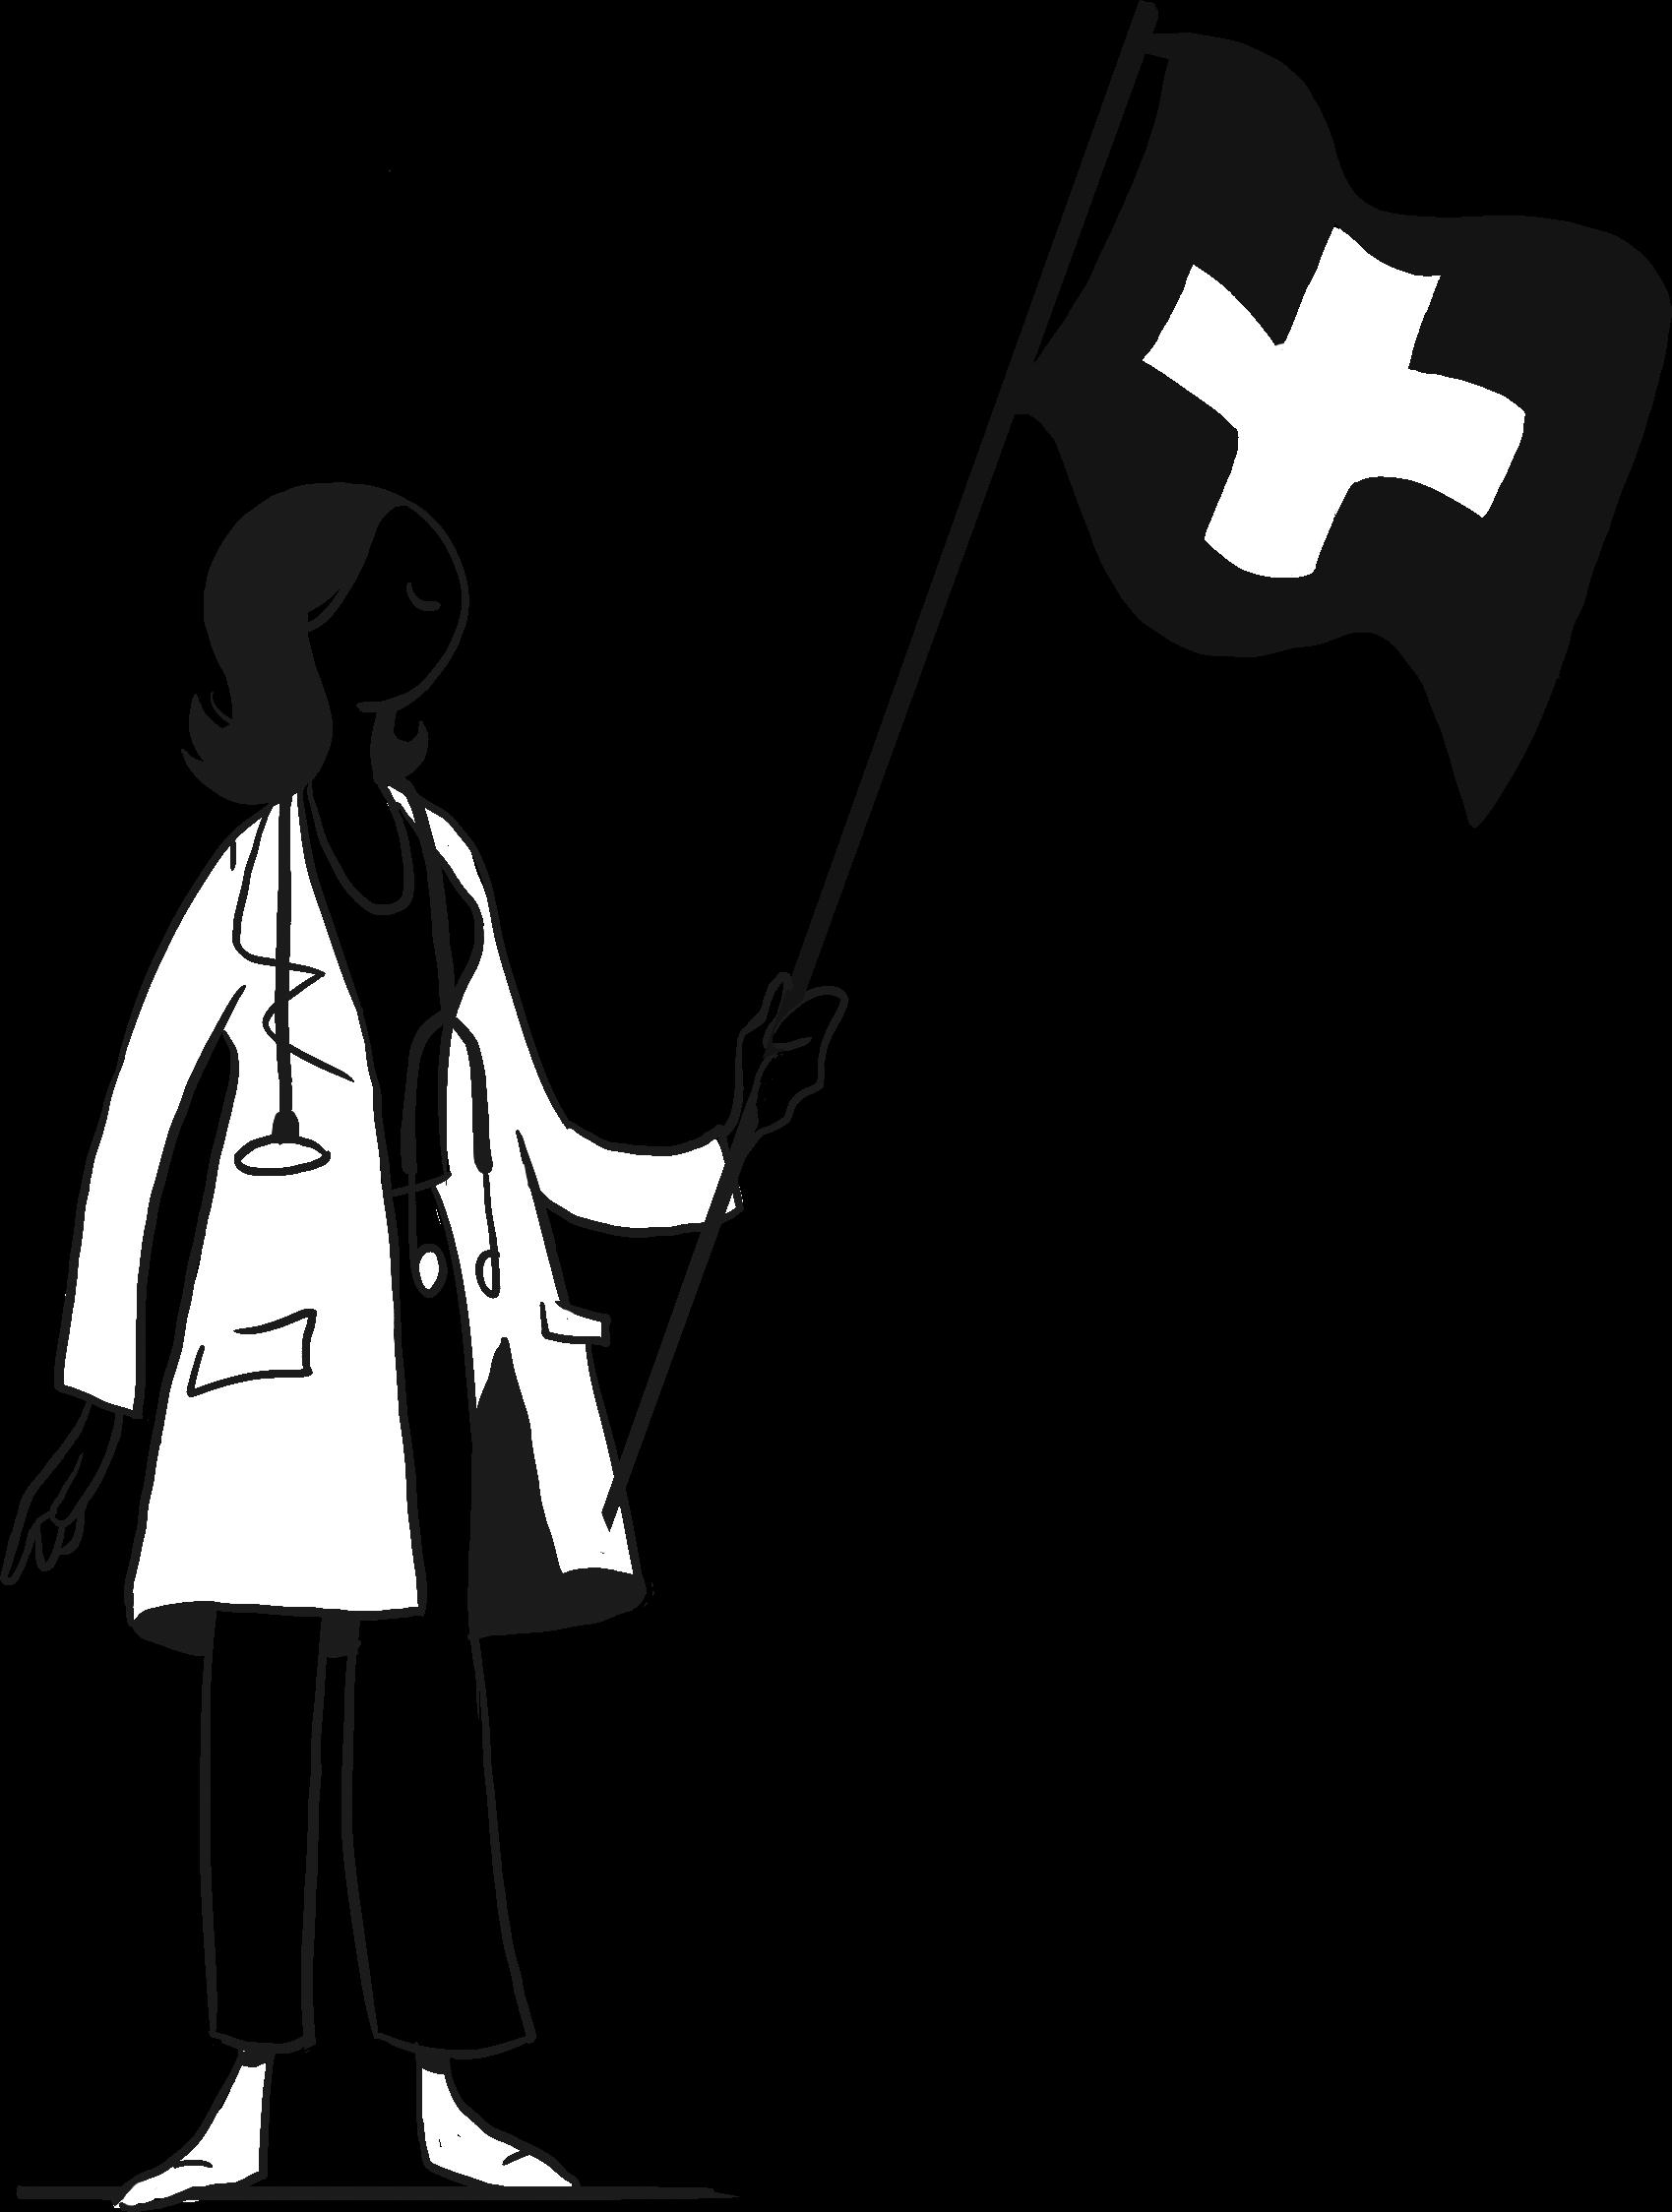 La lotta svizzera